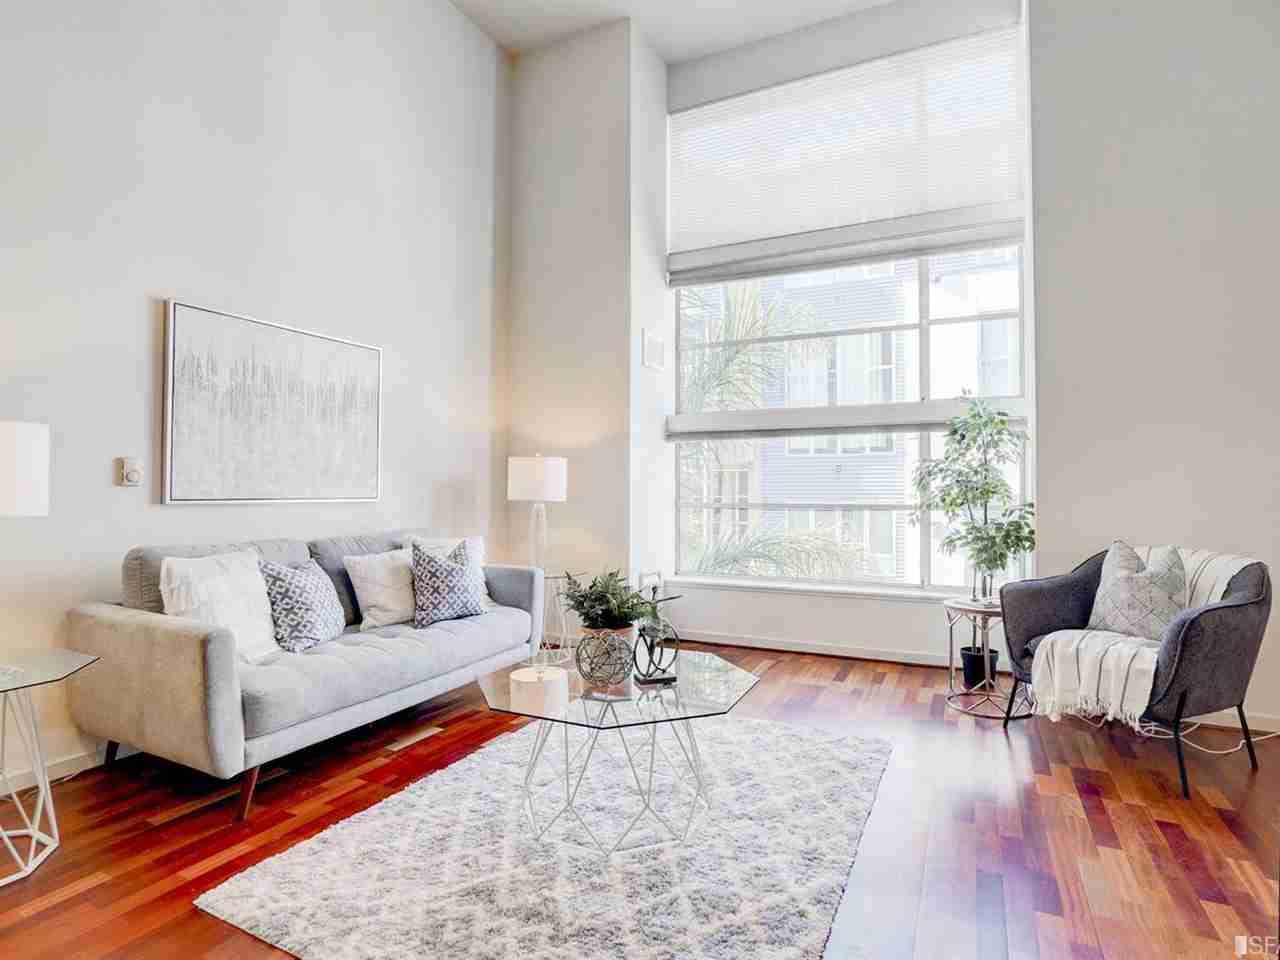 Sunny Living Room, 175 Bluxome Street #210 San Francisco, CA, 94107